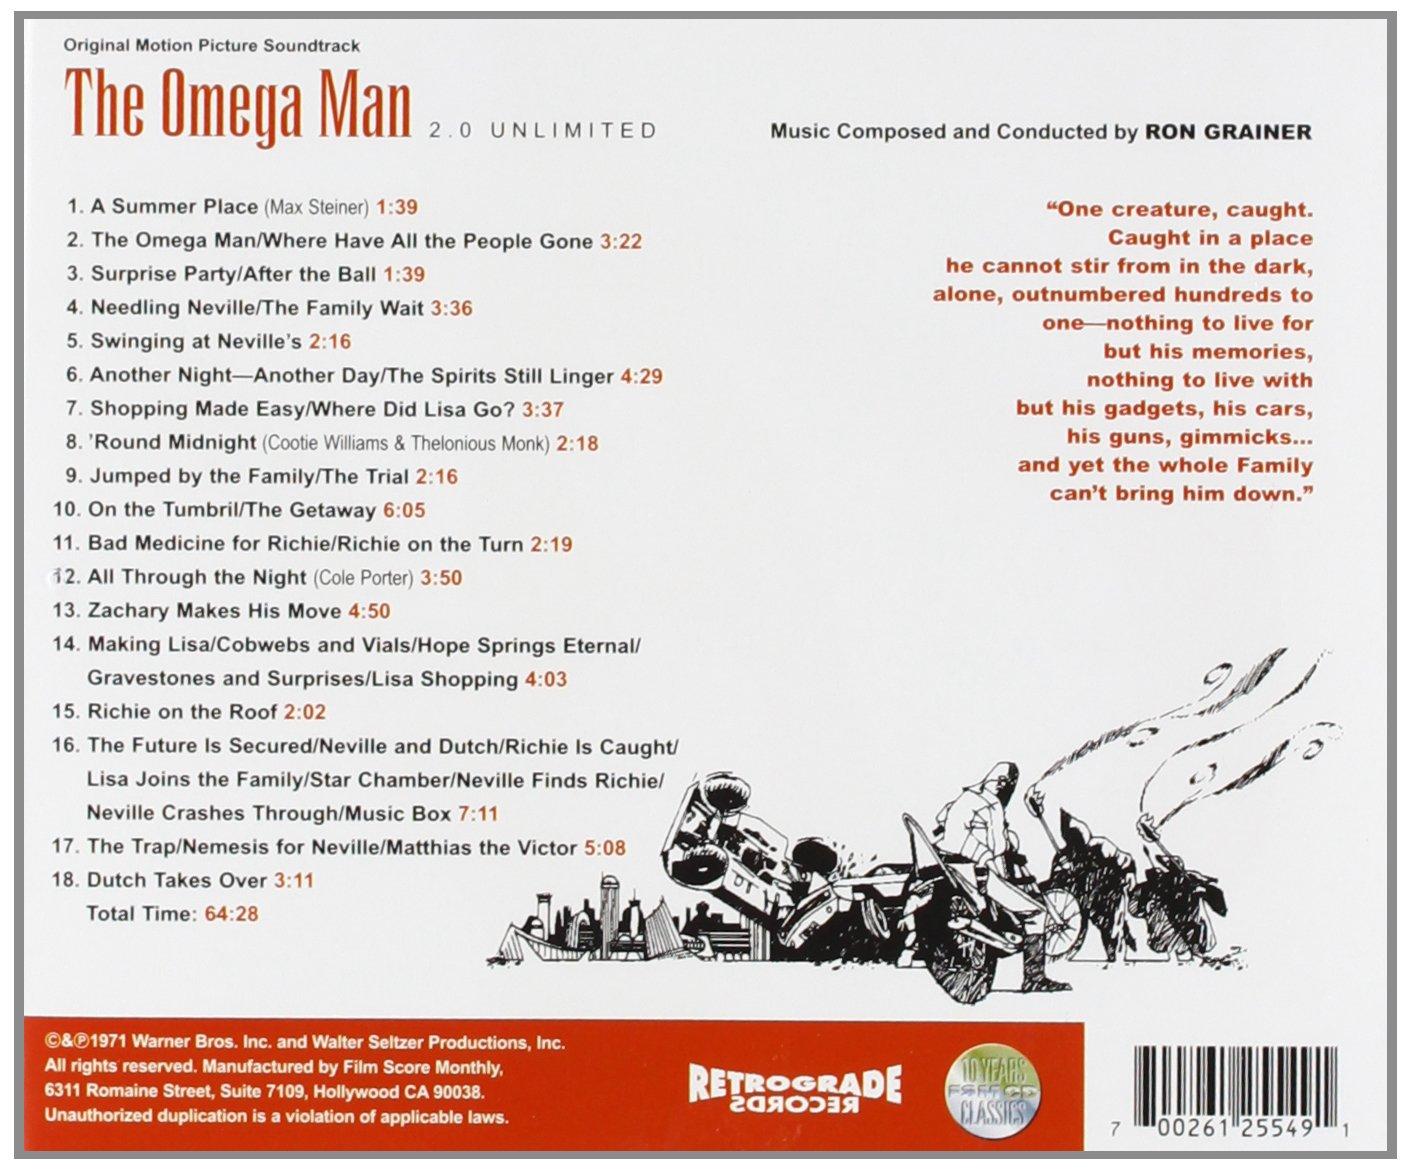 The Omega Man : Ron Grainer: Amazon.es: Música